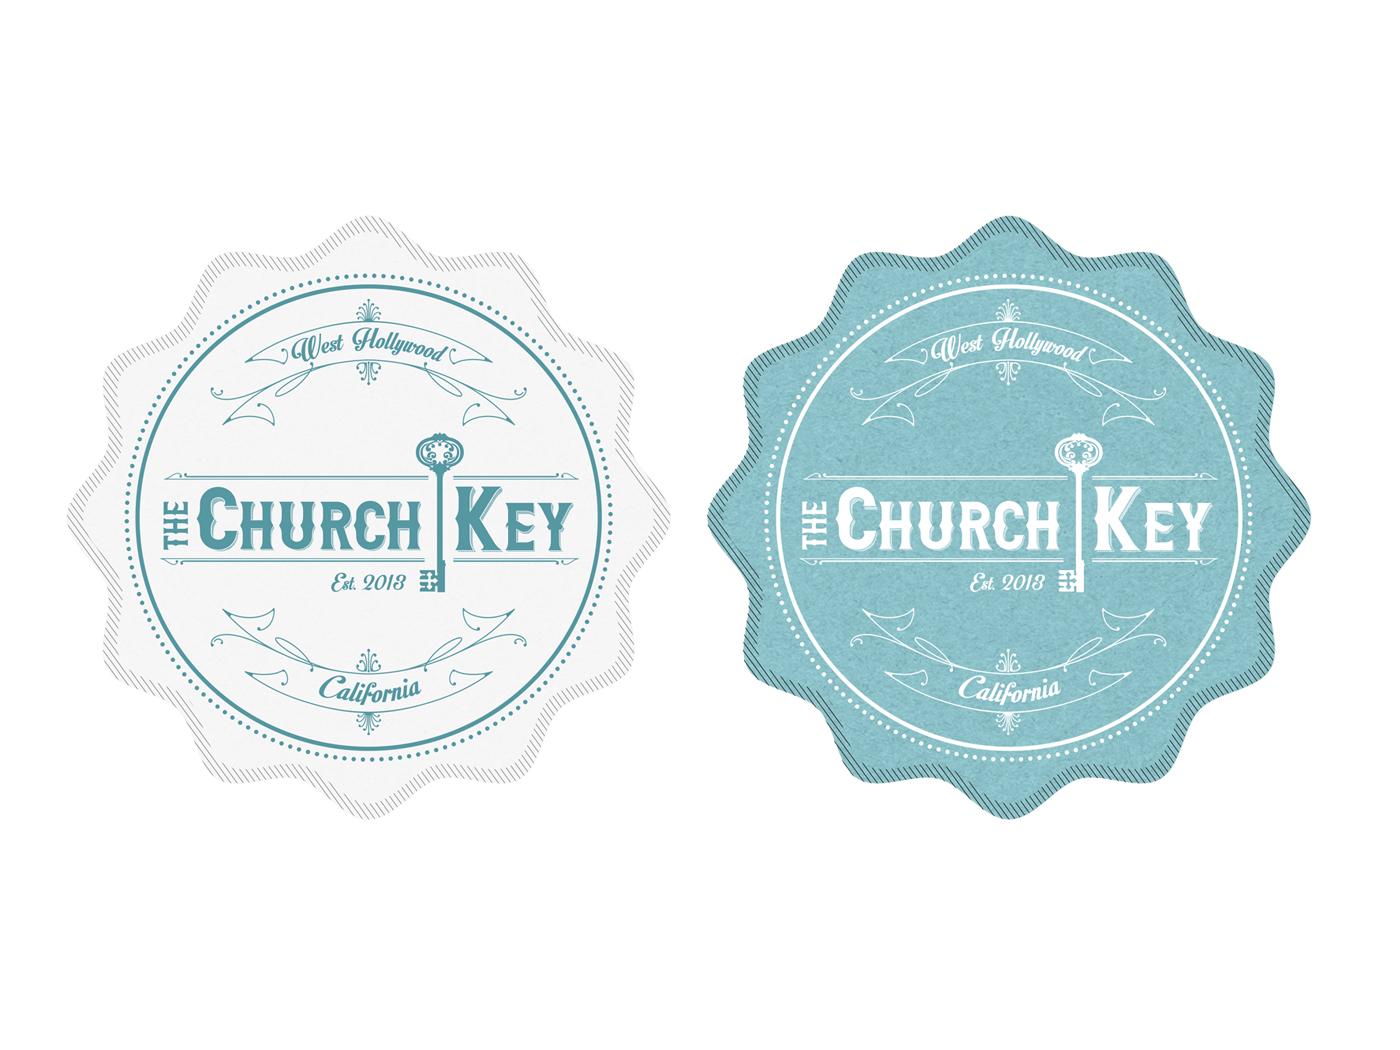 _0002_churchkey3.jpg